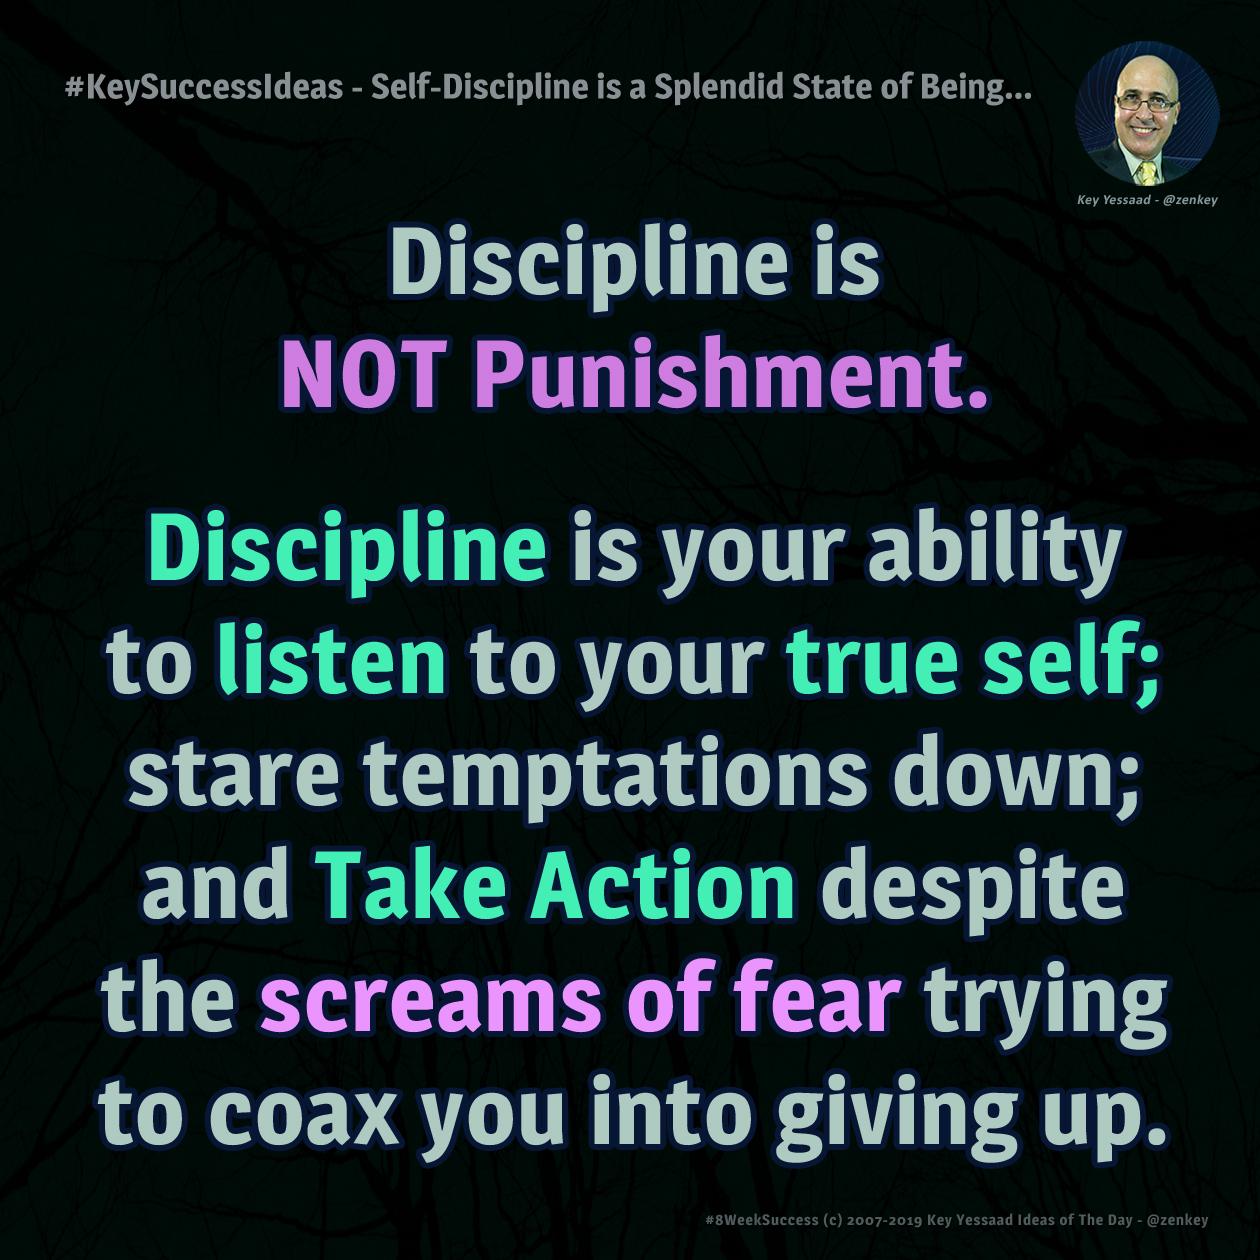 #KeySuccessIdeas - Self-Discipline is a Splendid State of Being...